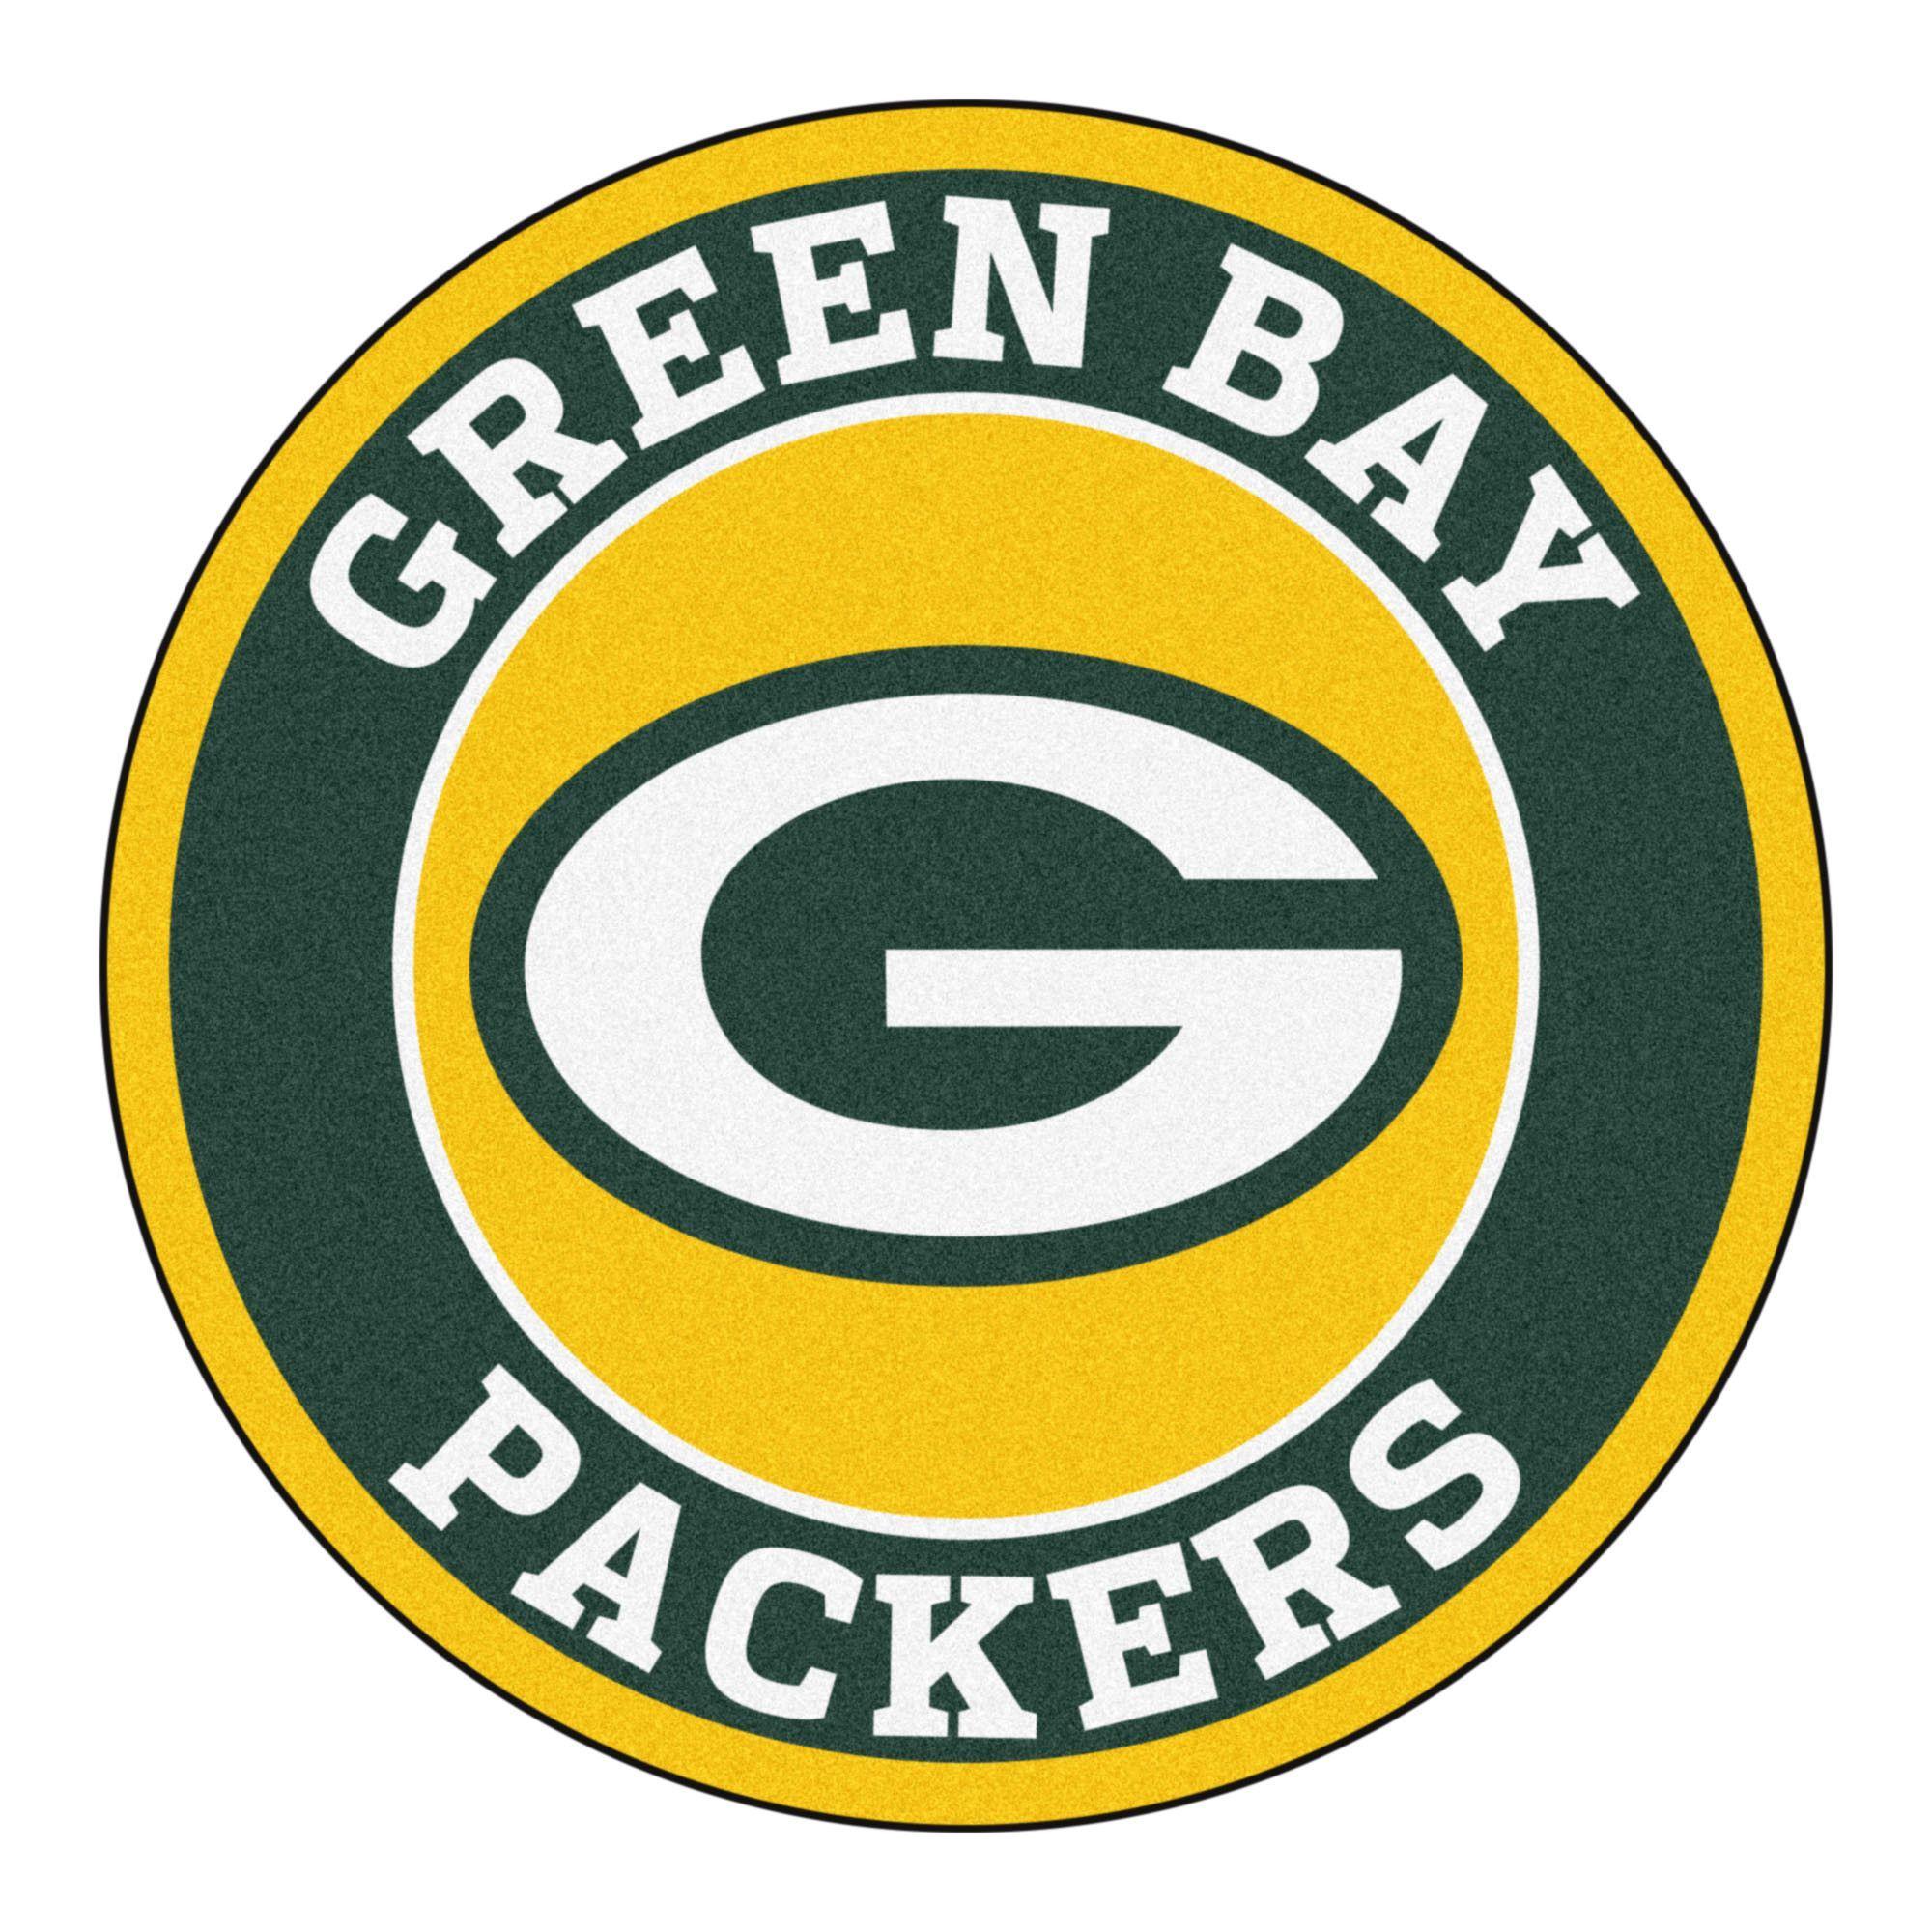 Nfl Green Bay Packers Roundel 27 In X 27 In Non Slip Indoor Only Mat Green Bay Packers Logo Green Bay Packers Team Nfl Green Bay